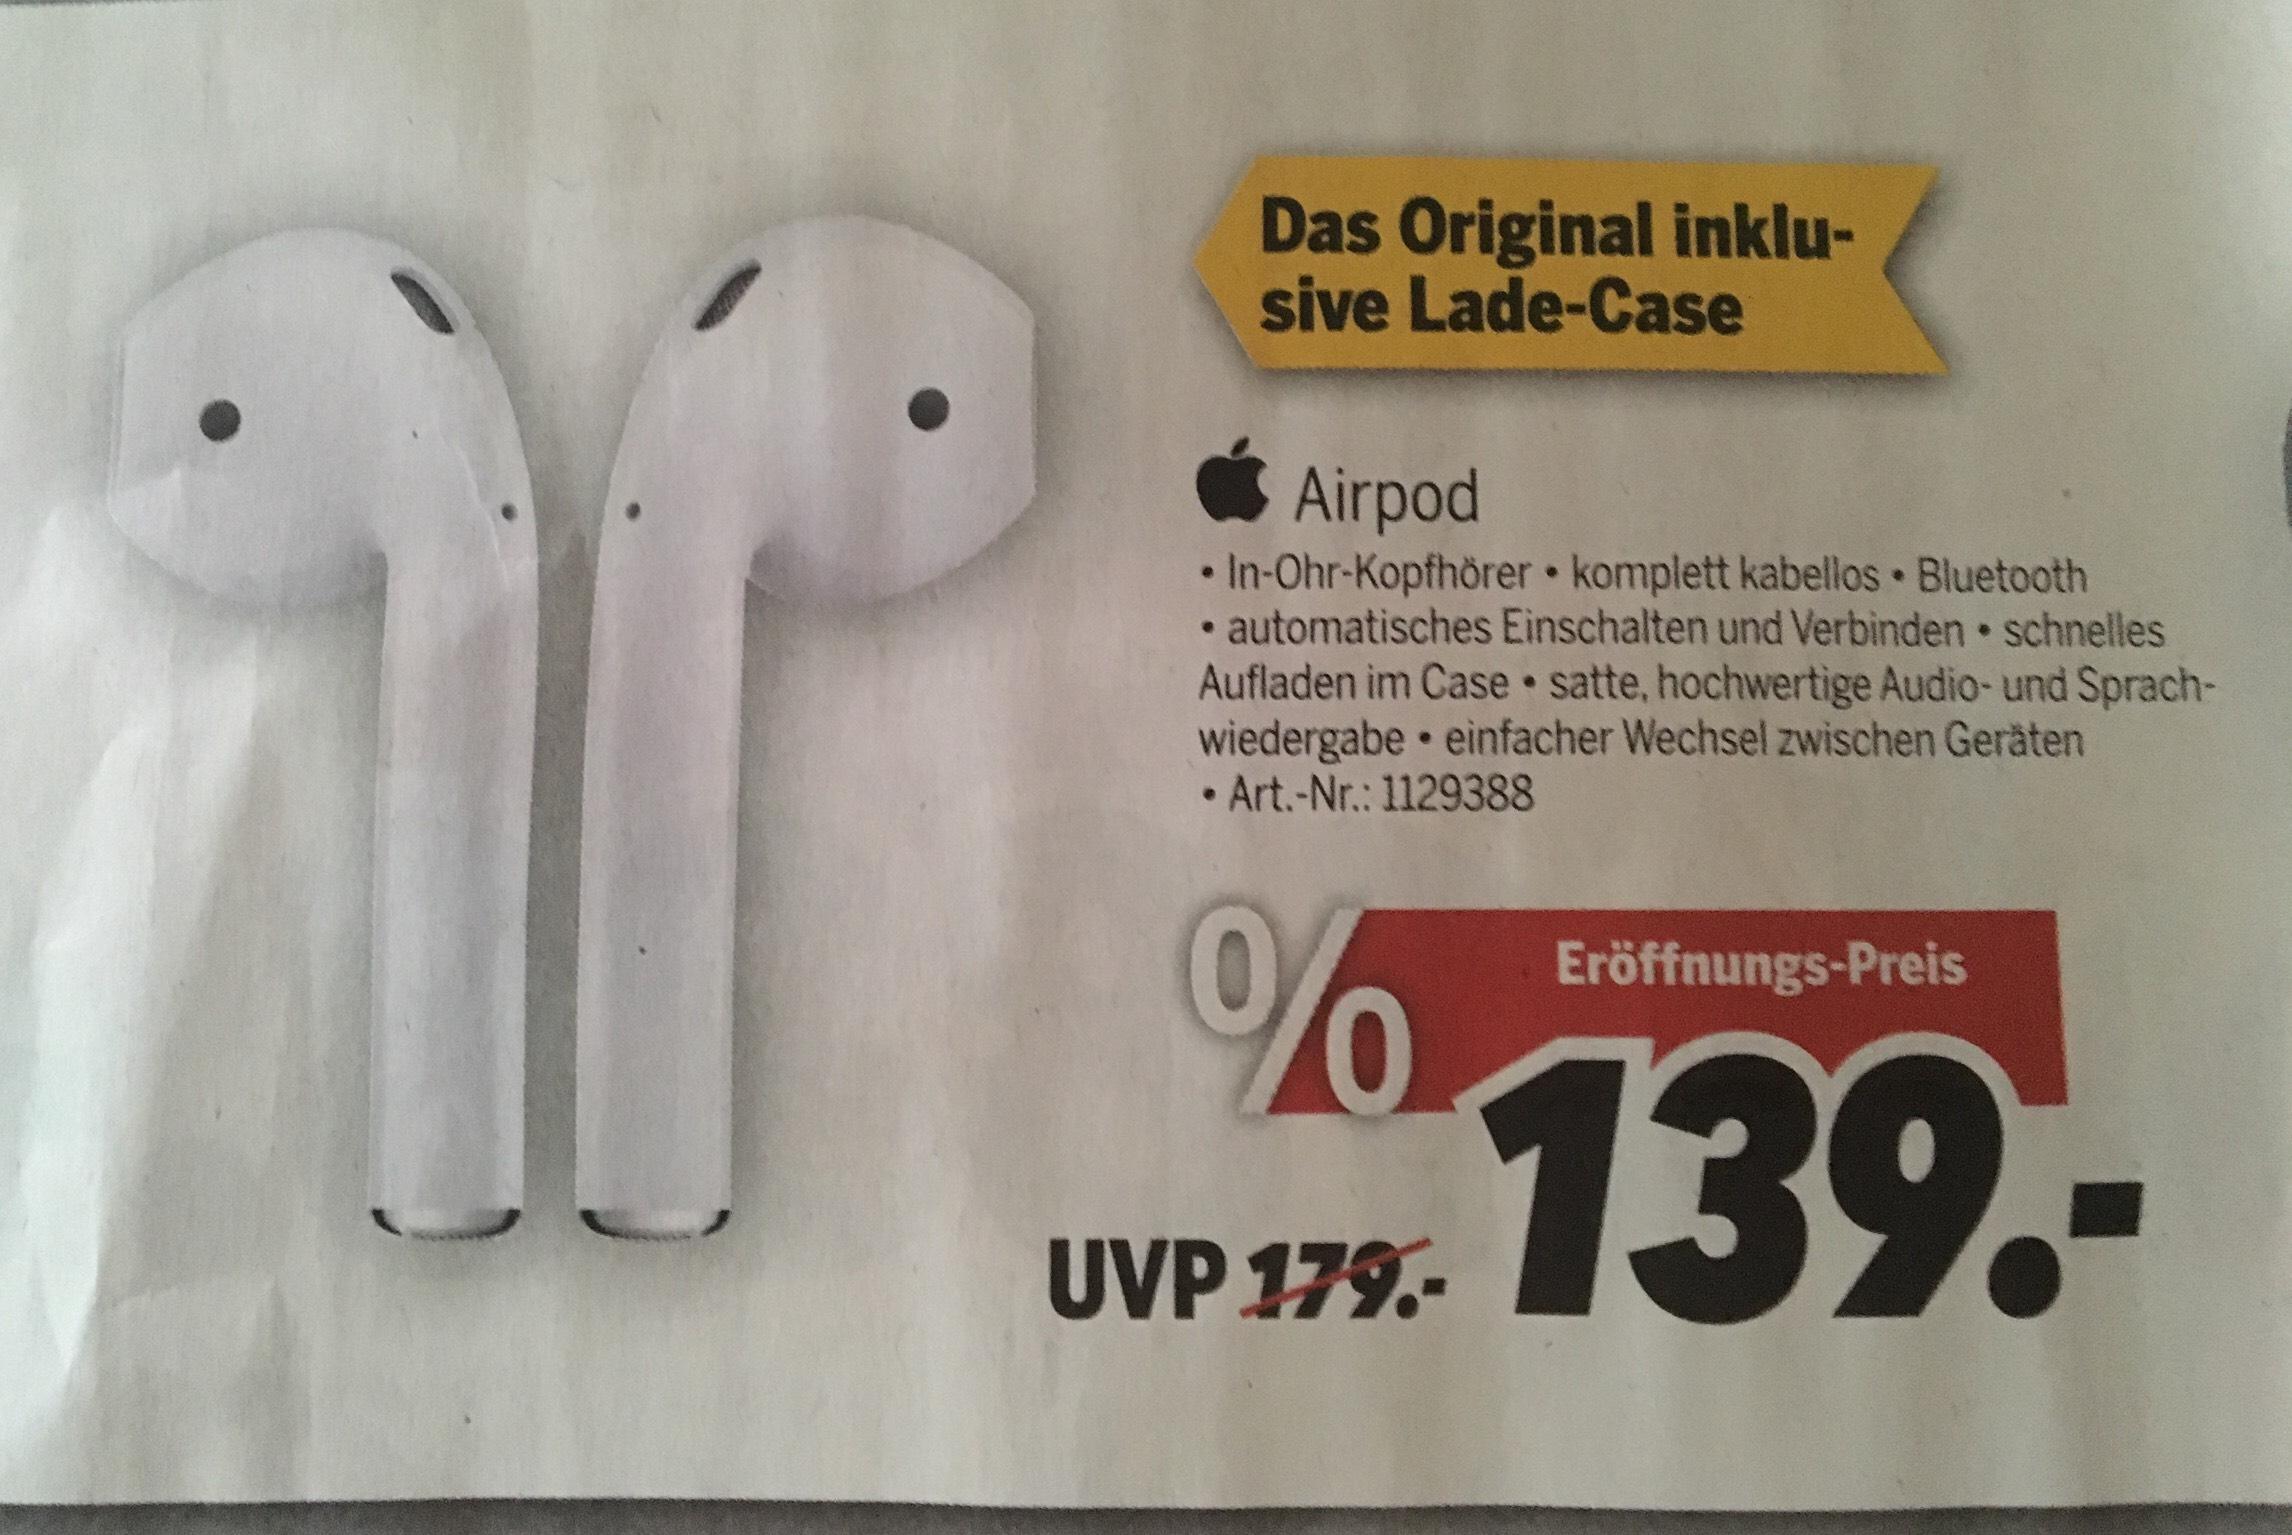 Apple AirPod Lokal Medimax(Hildesheim)